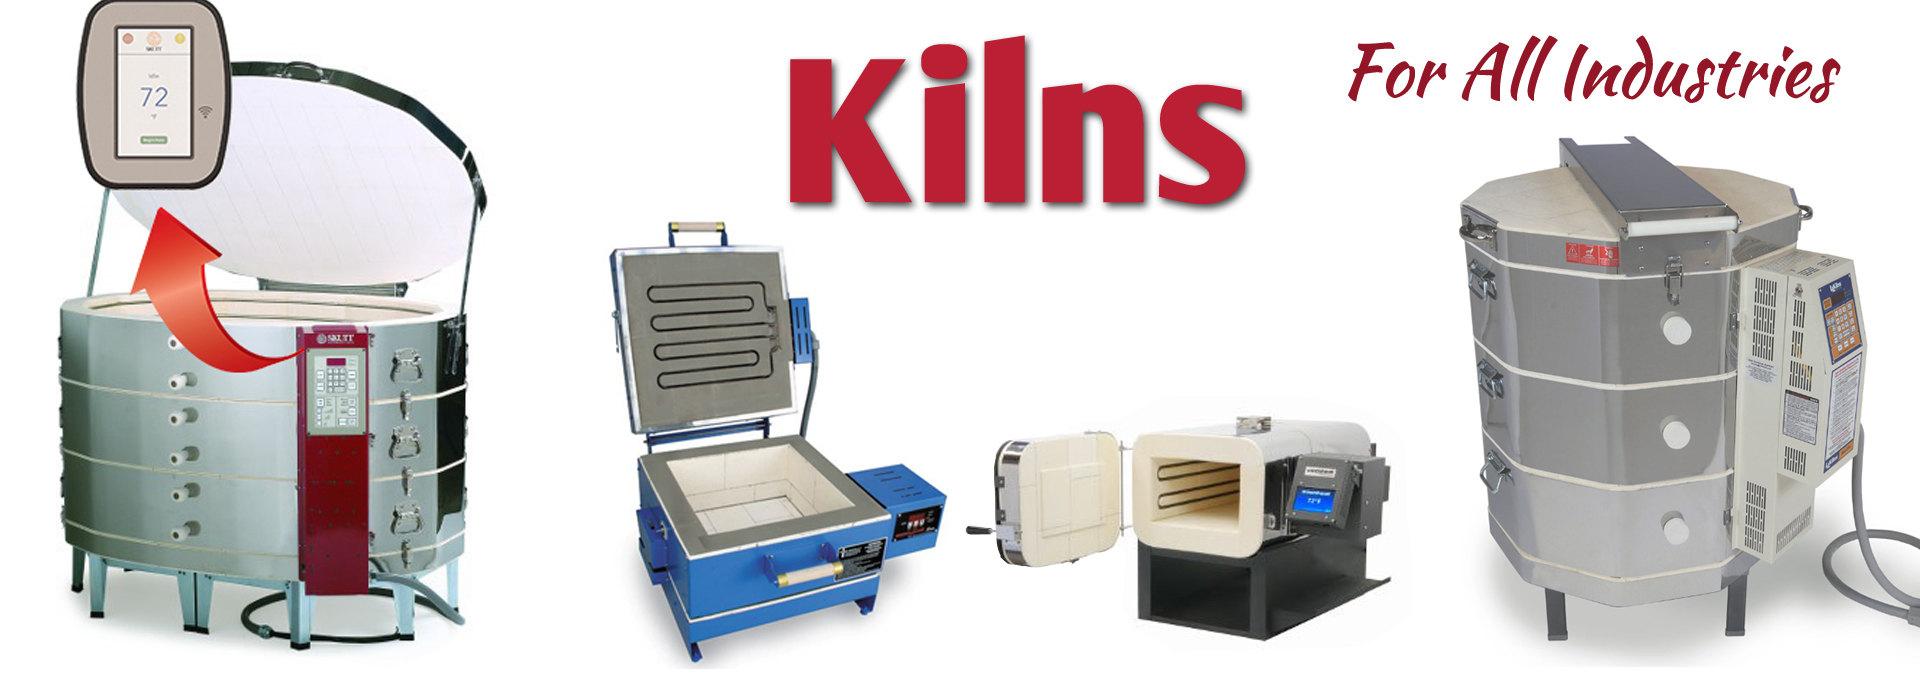 Discounted Kilns